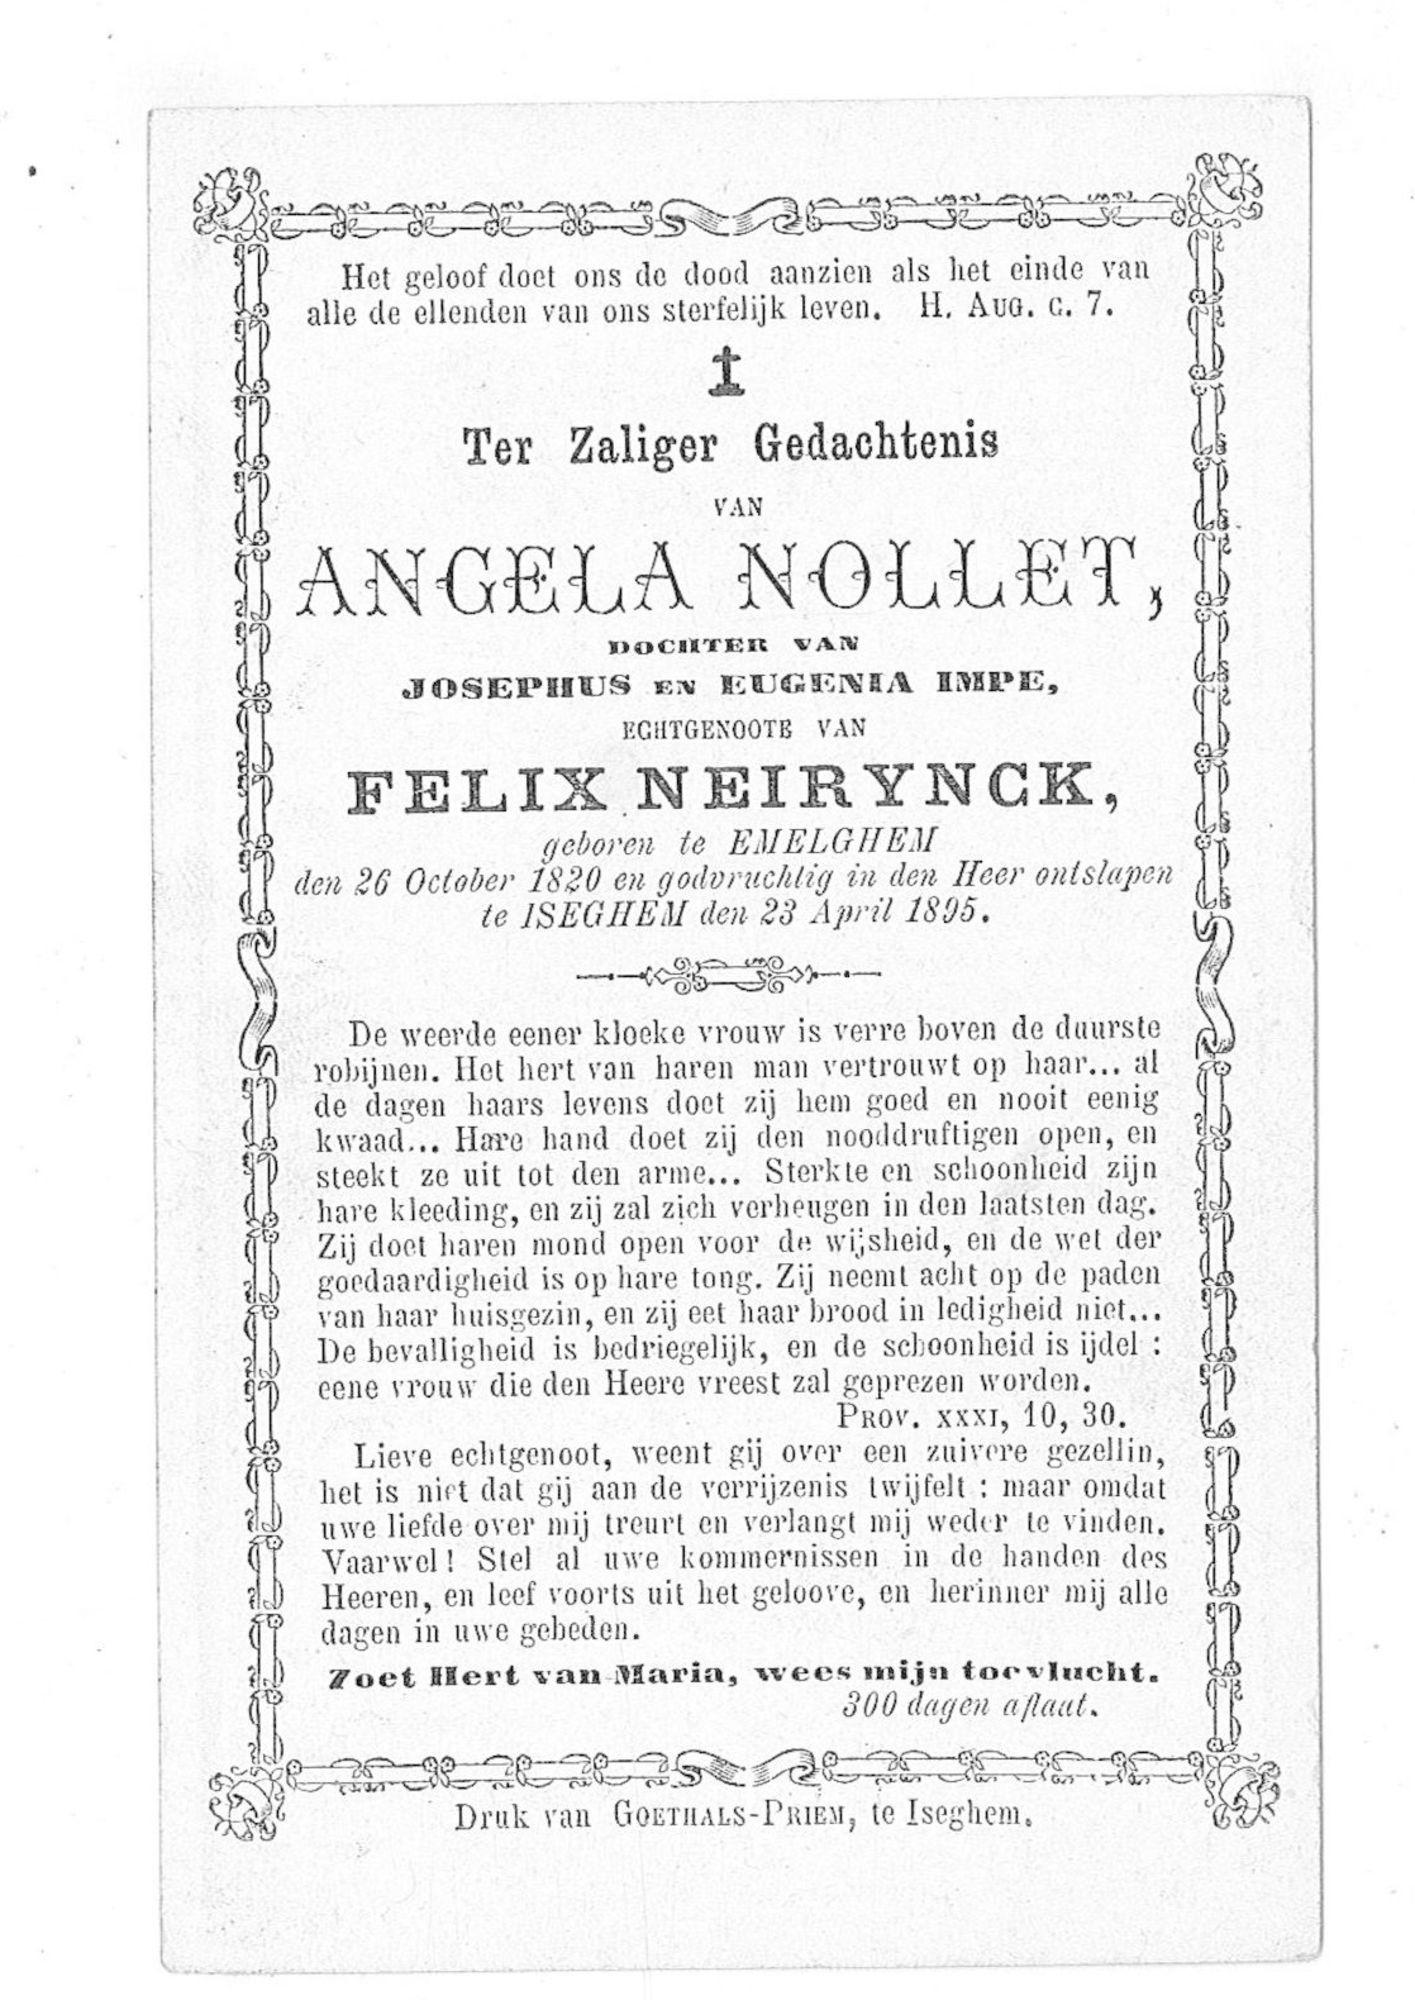 Angela Nollet